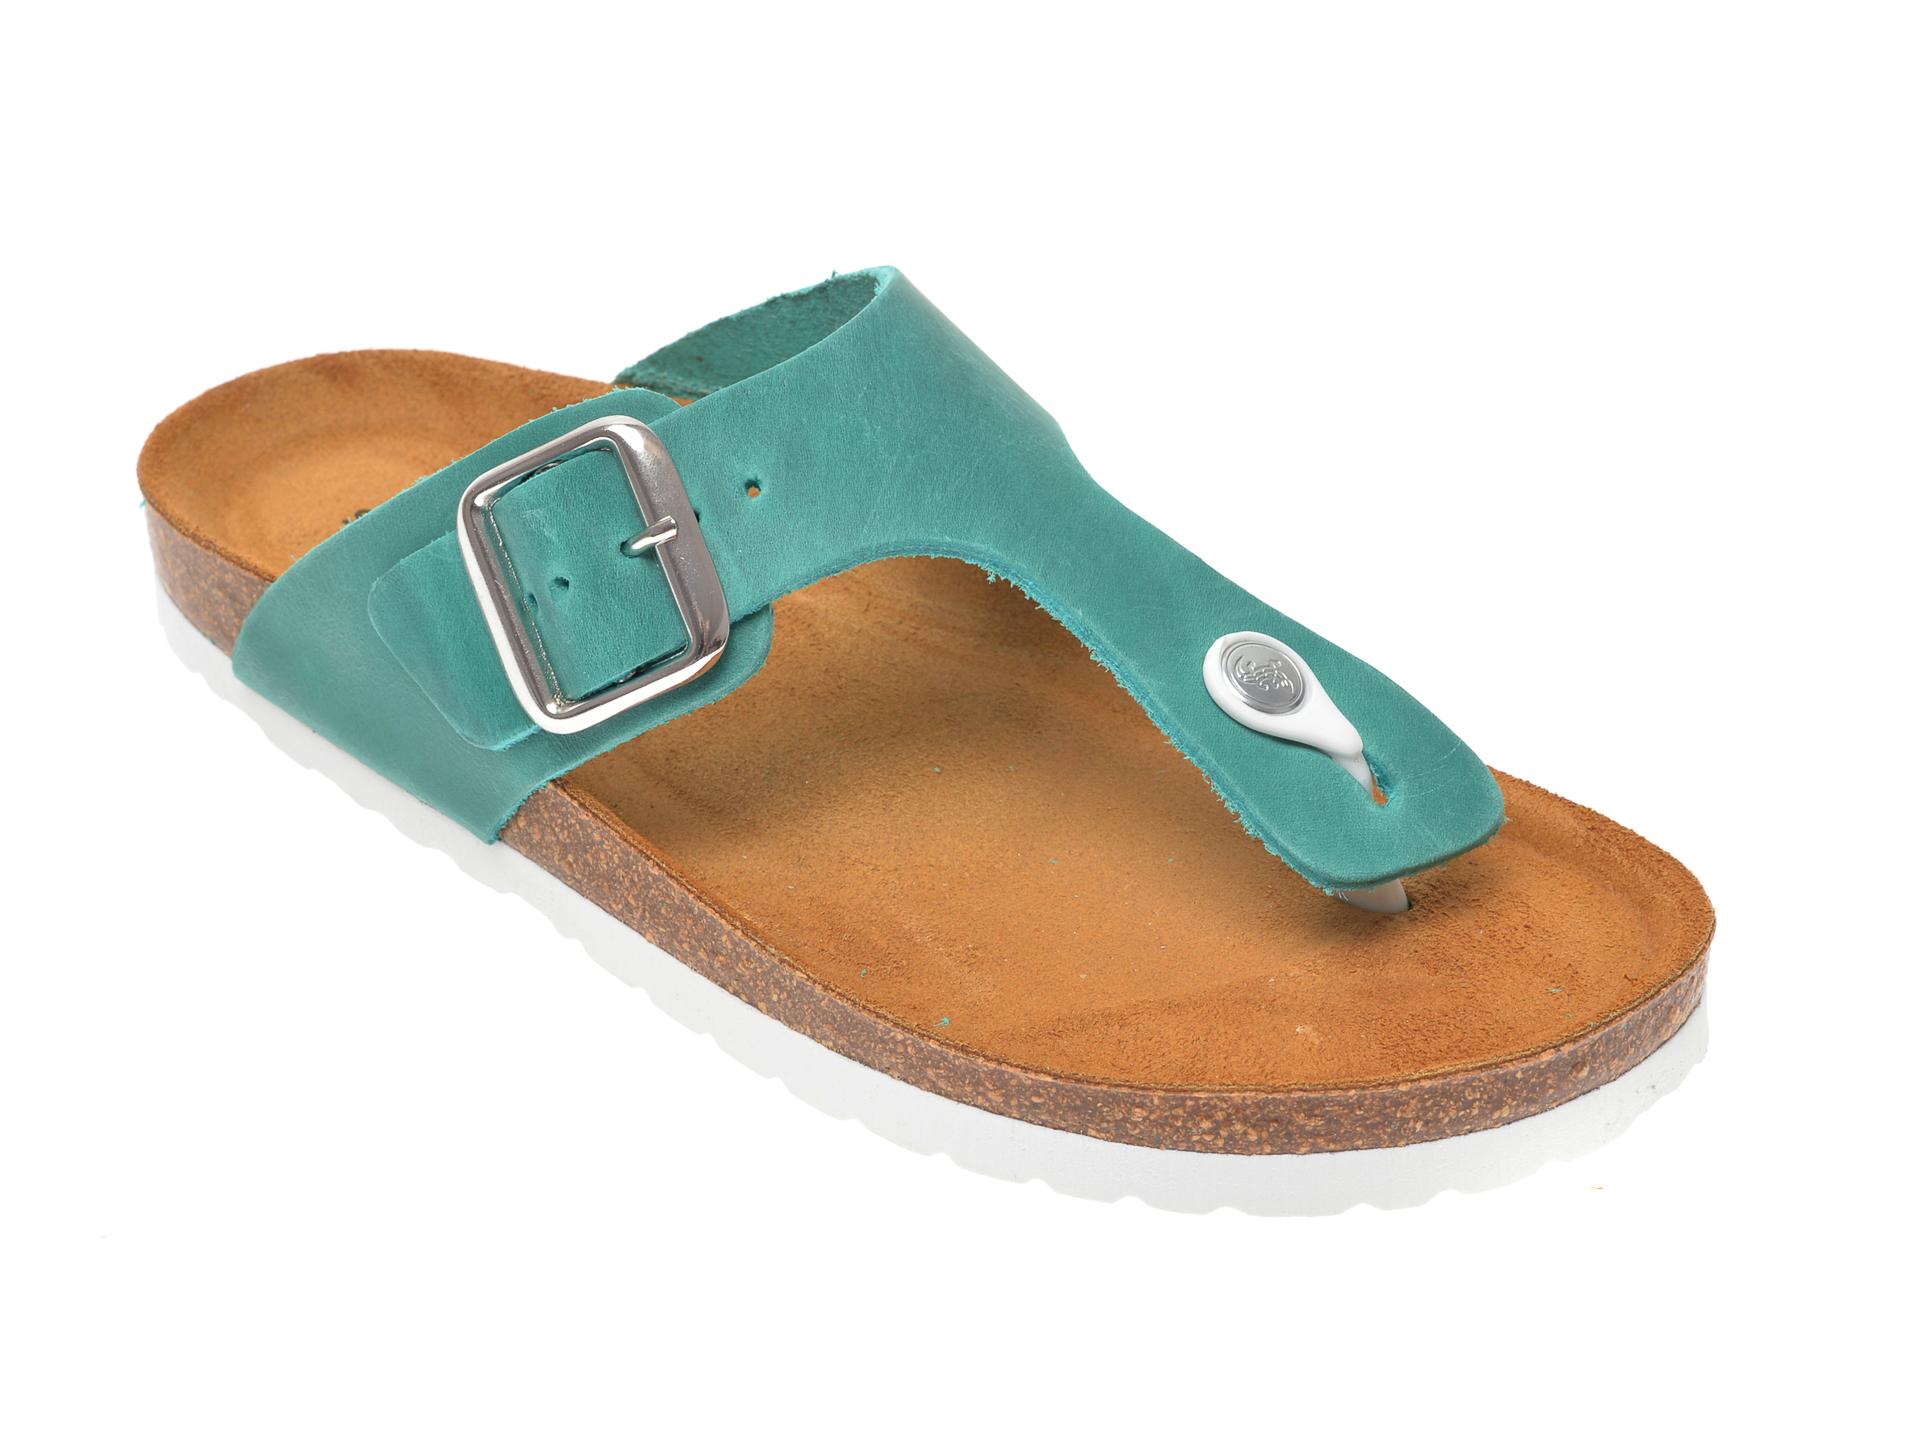 Papuci SALAMANDER verzi, 13014, din piele naturala imagine